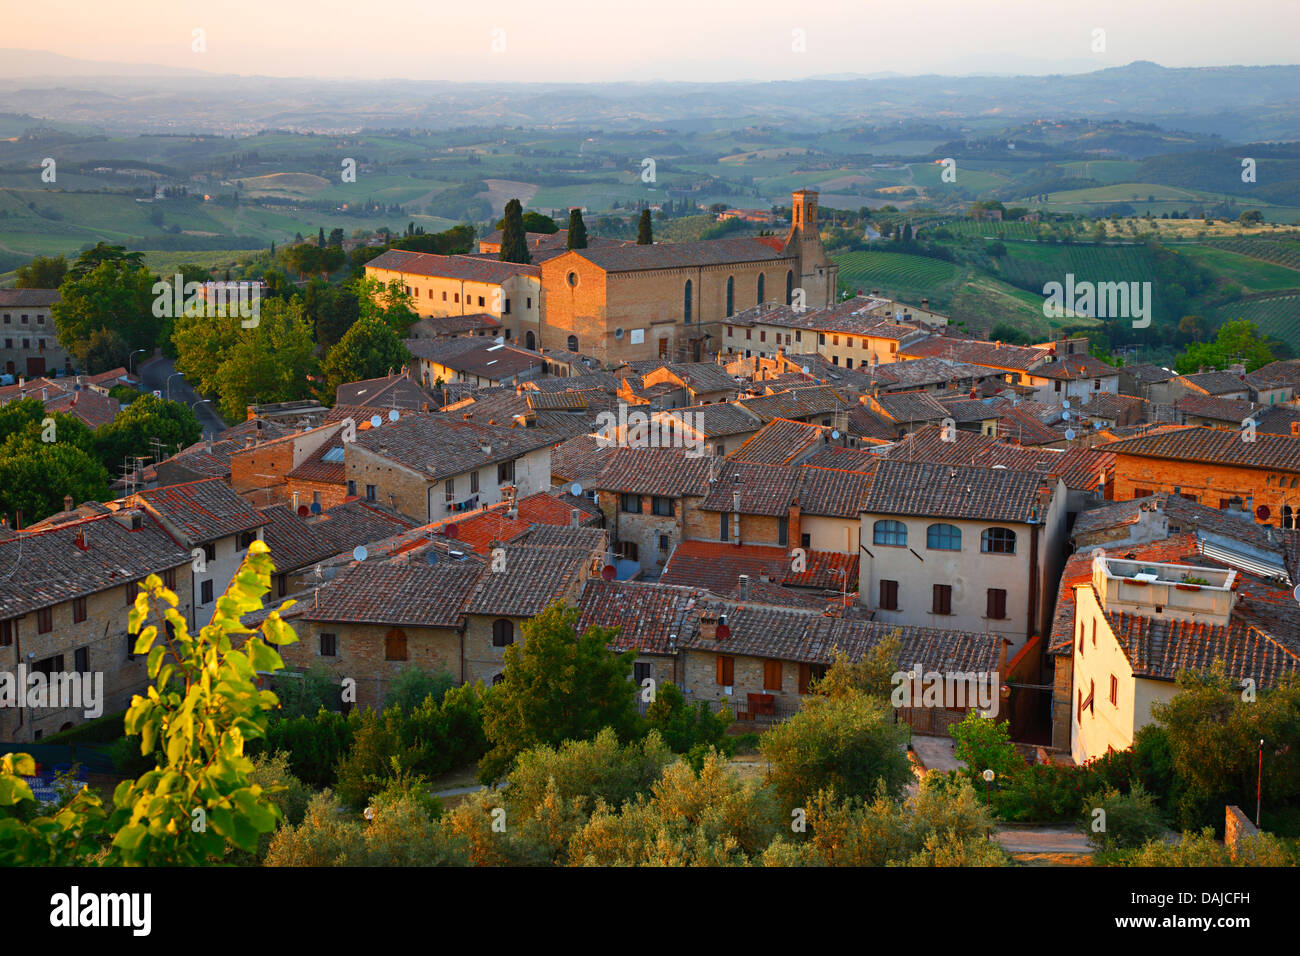 San Gimignano, église de Sant'Agostino, Italie Photo Stock